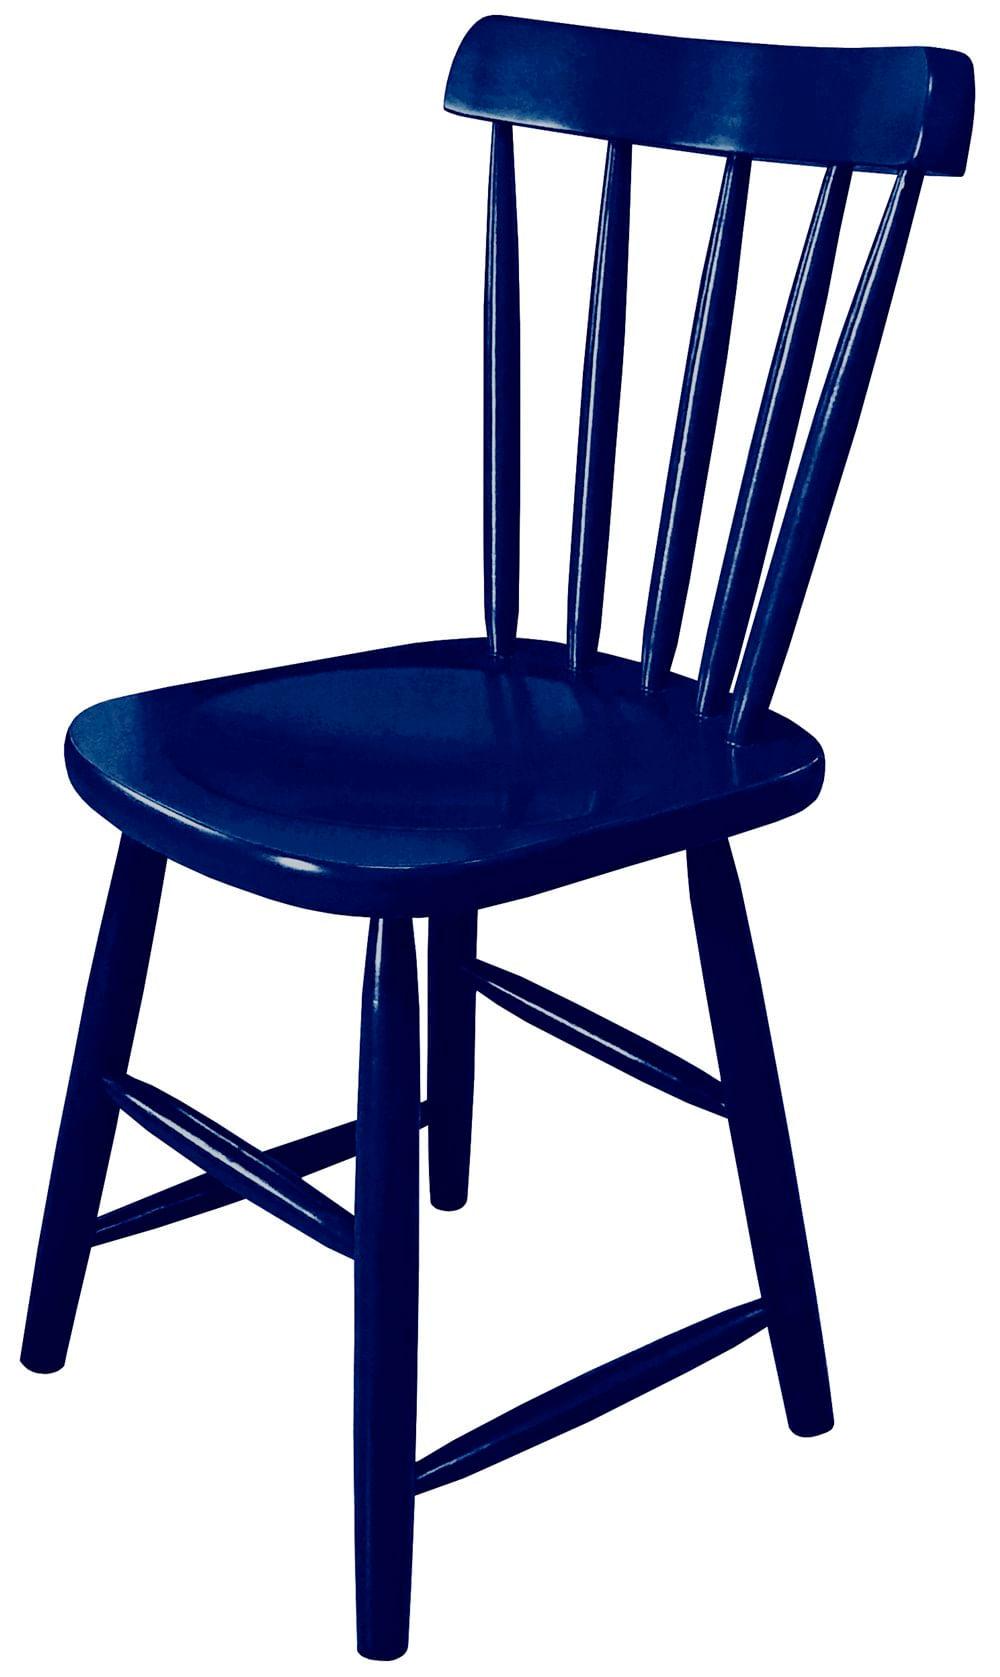 Cadeira Skand Assento Escavado Cor Azul - 33365